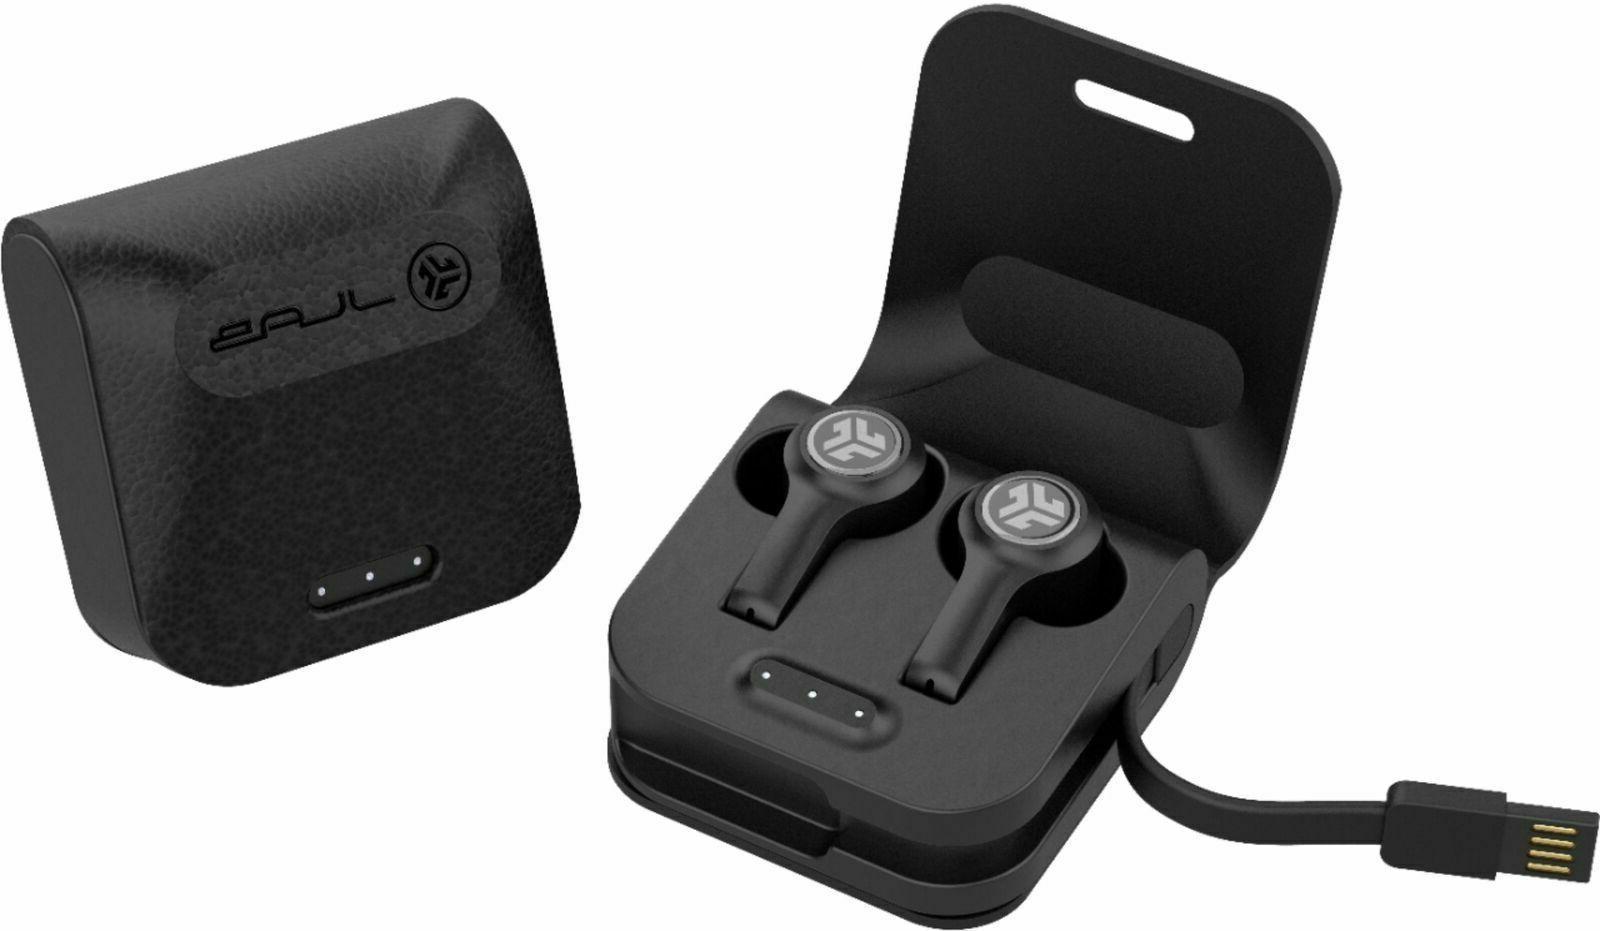 NEW Audio JBuds Executive Wireless Earbuds